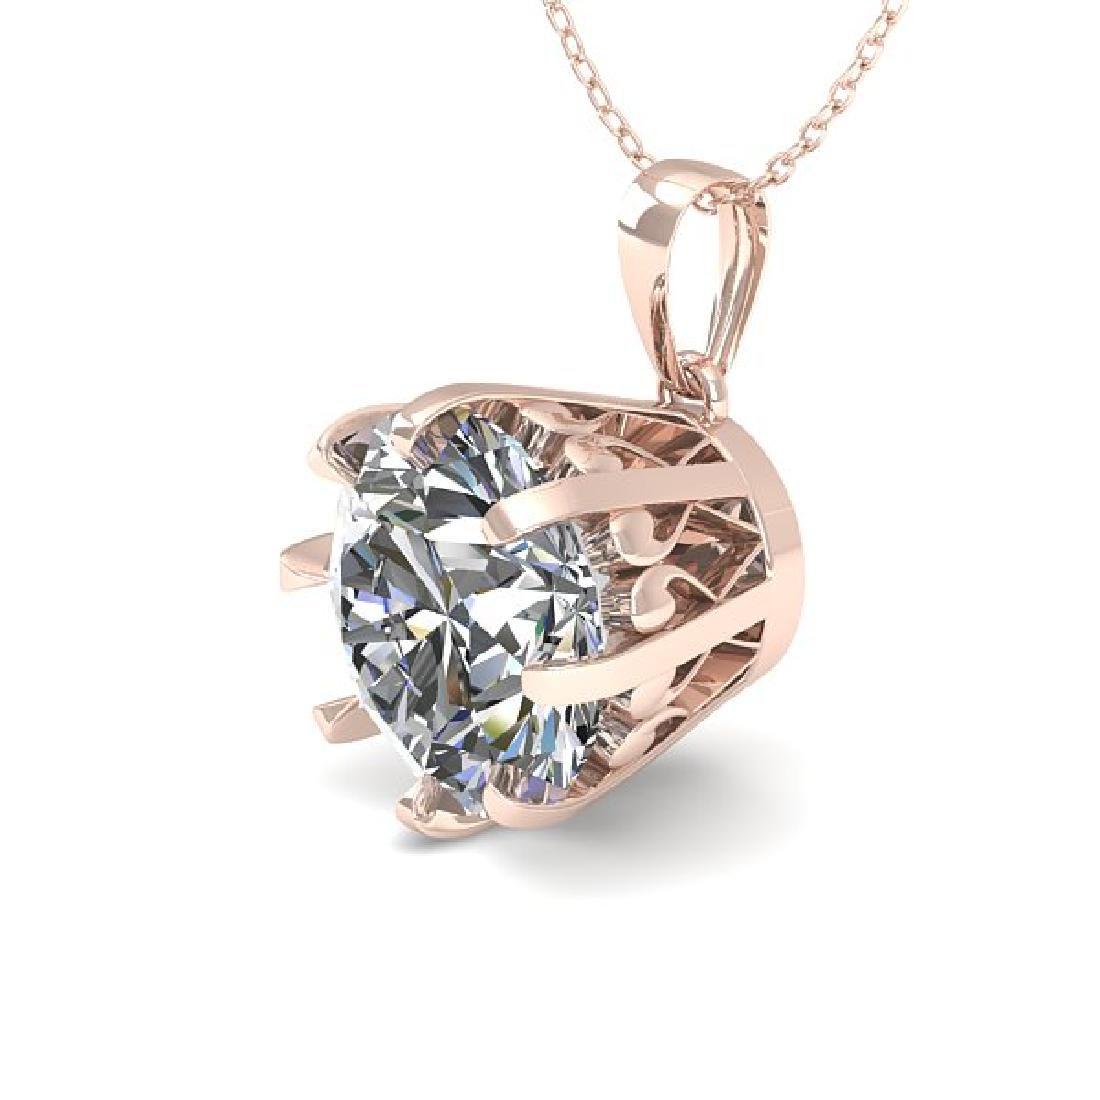 2 CTW VS/SI Diamond Solitaire Necklace 18K Rose Gold